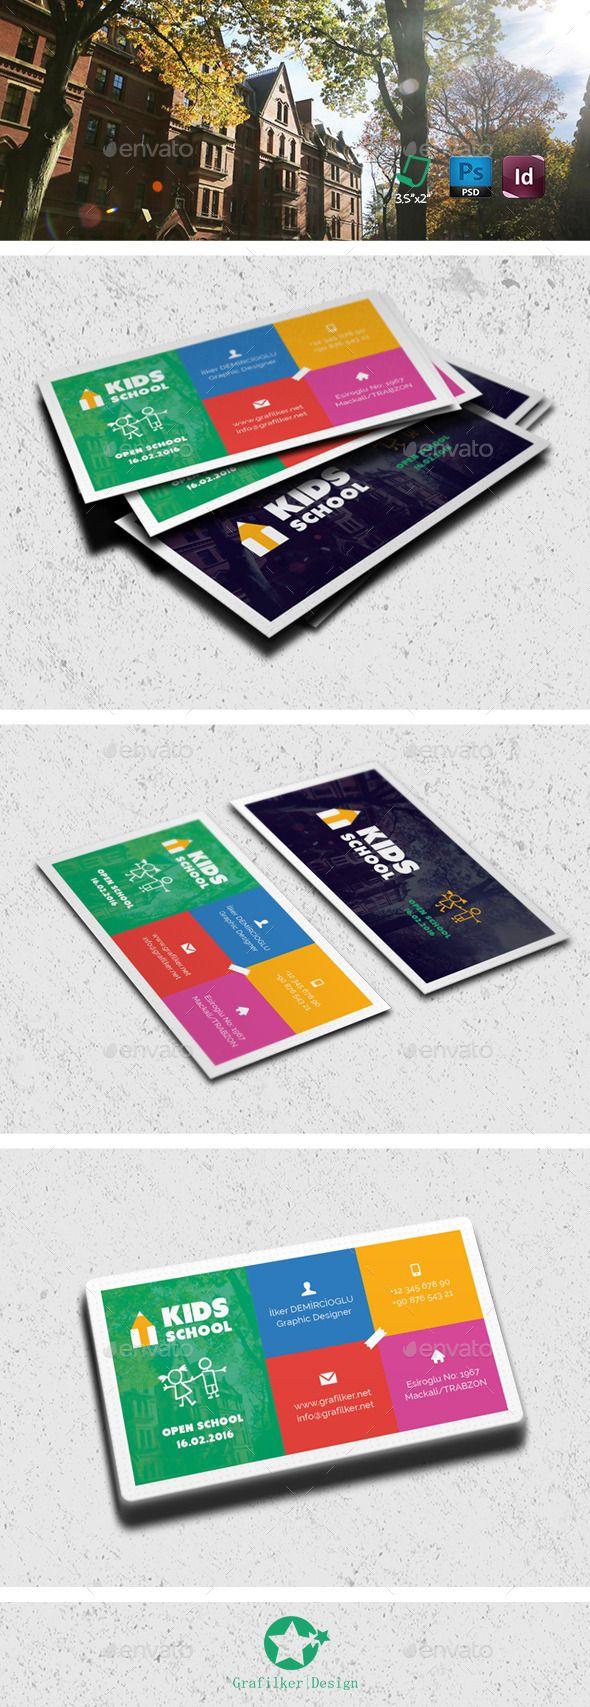 Kids School Business Card Templates | Card templates, Business cards ...